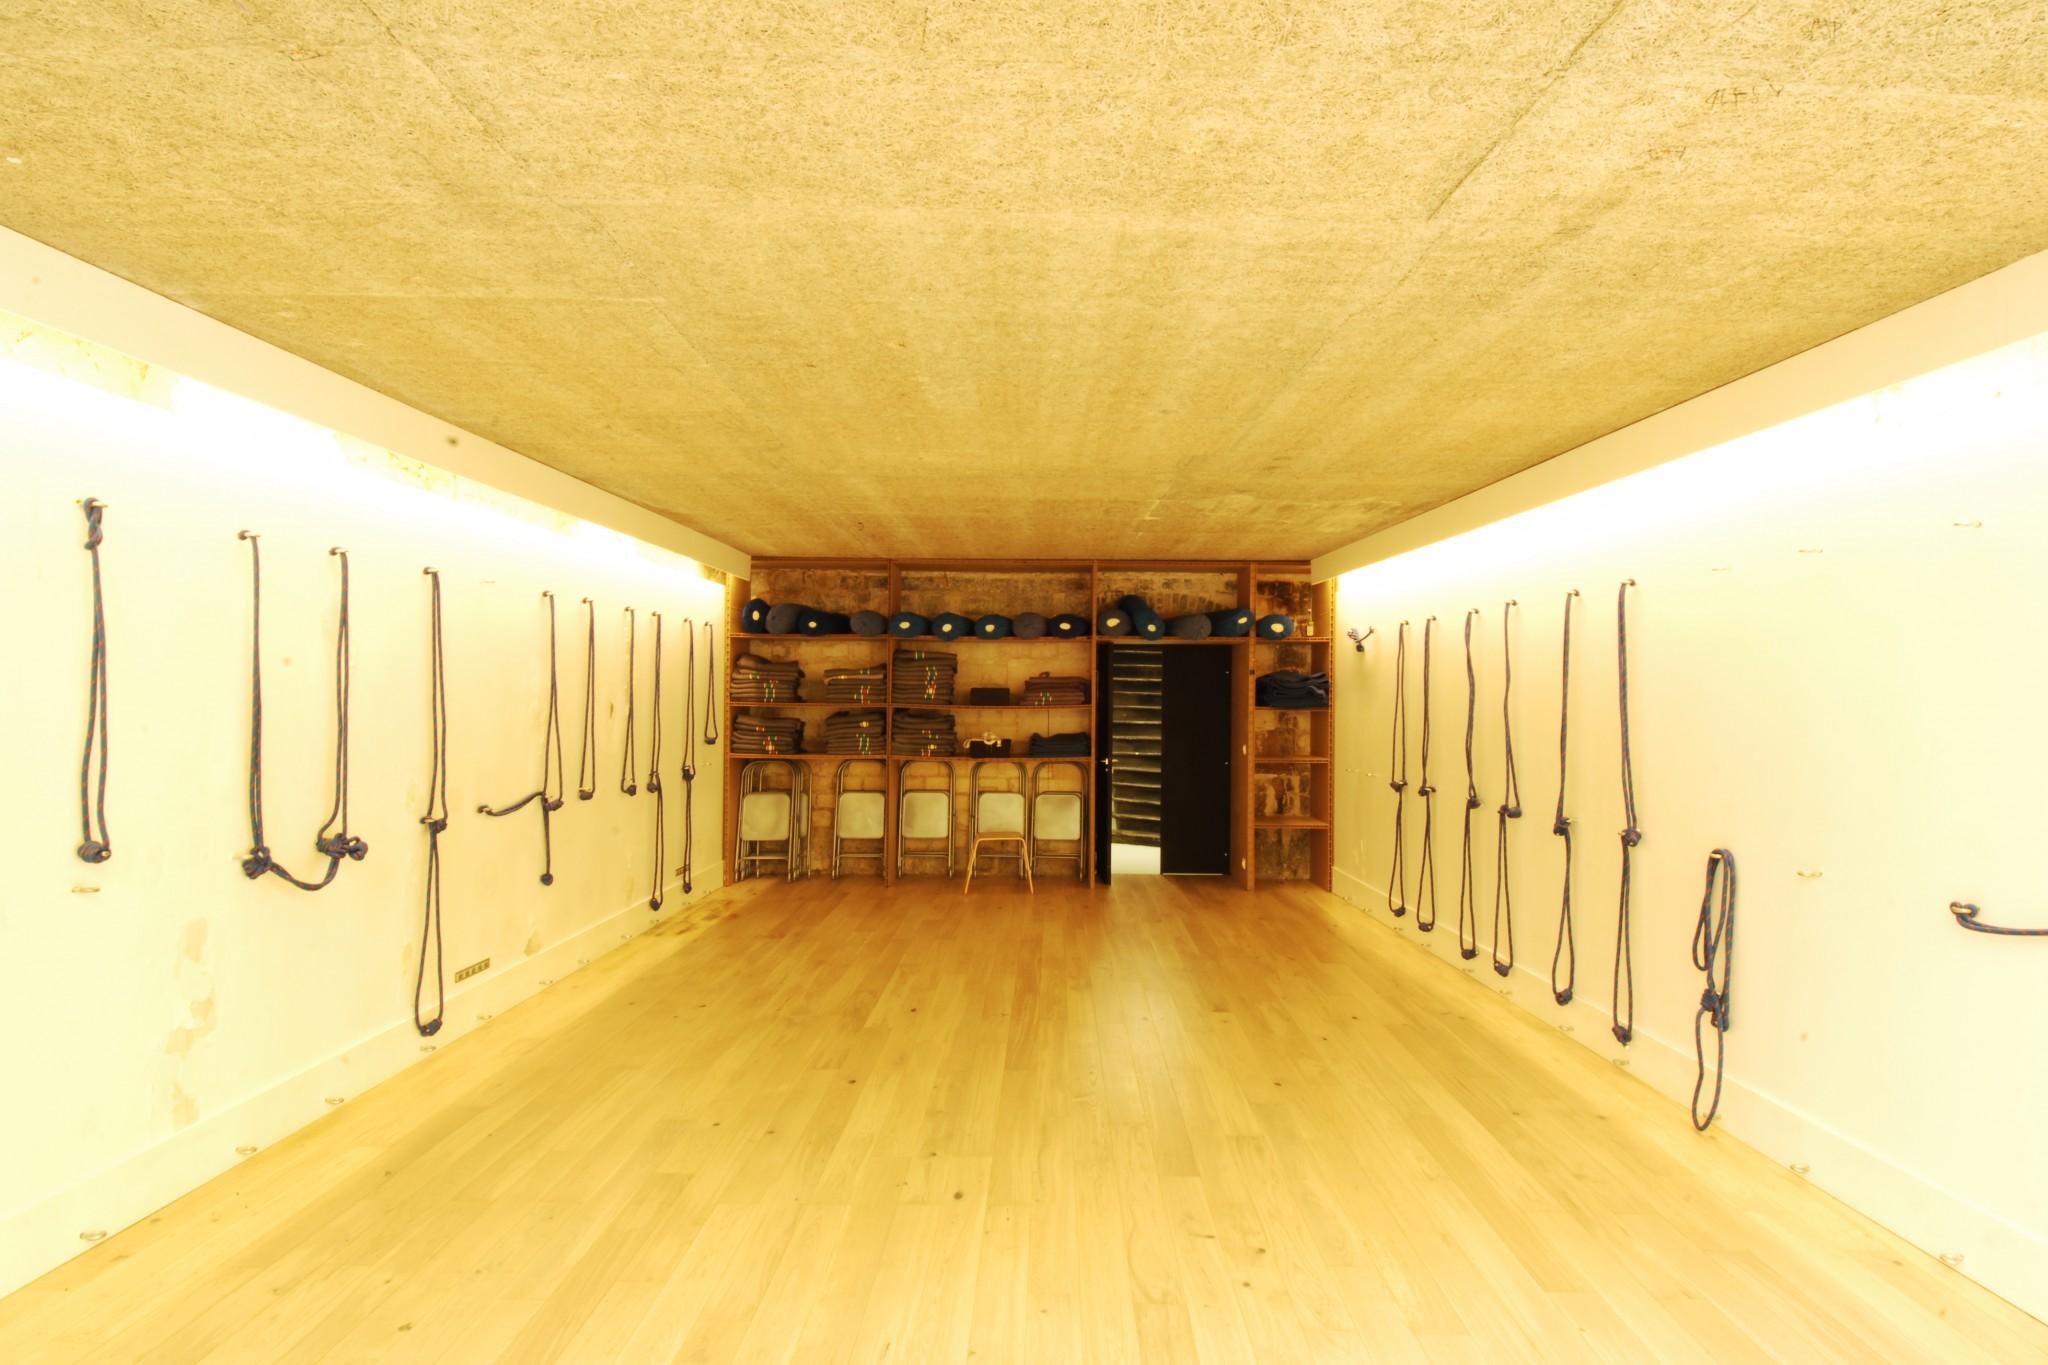 studio-2-view-of-shelves